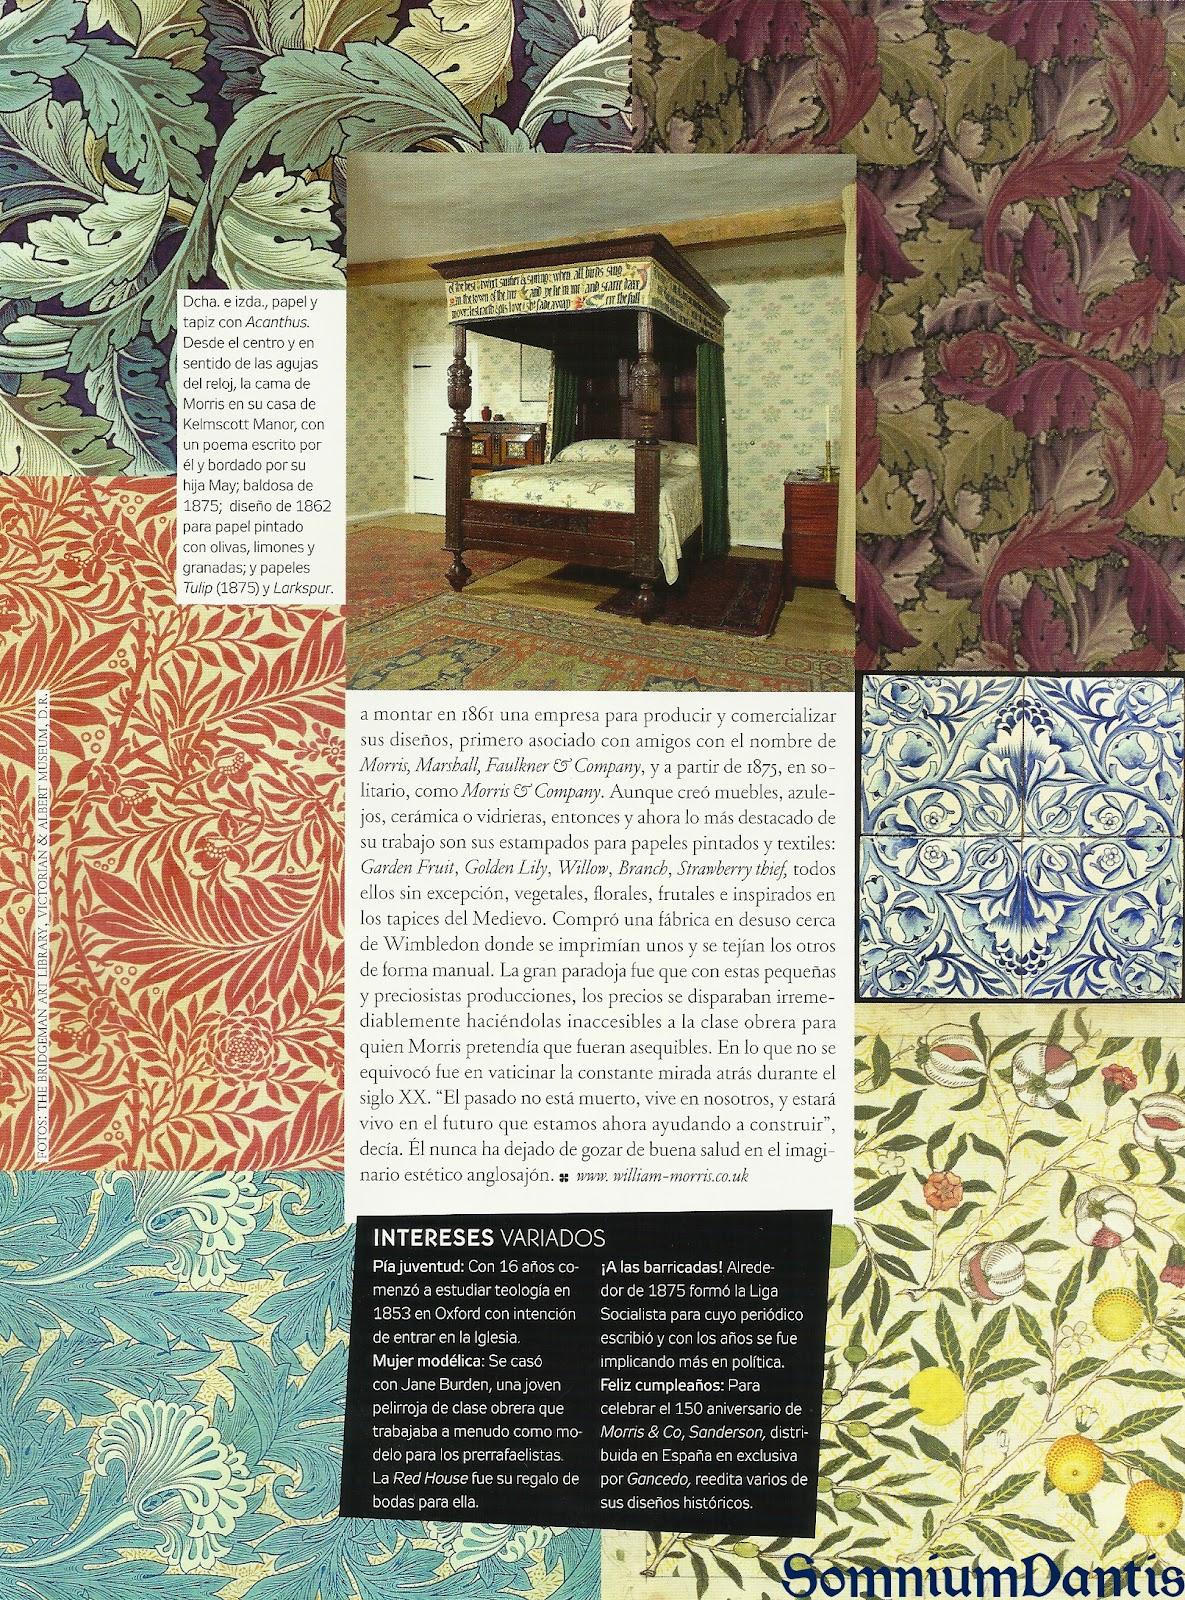 La discreta elegancia del siglo XIX inglés: Los Prerafaelitas - Página 2 Williammorris2